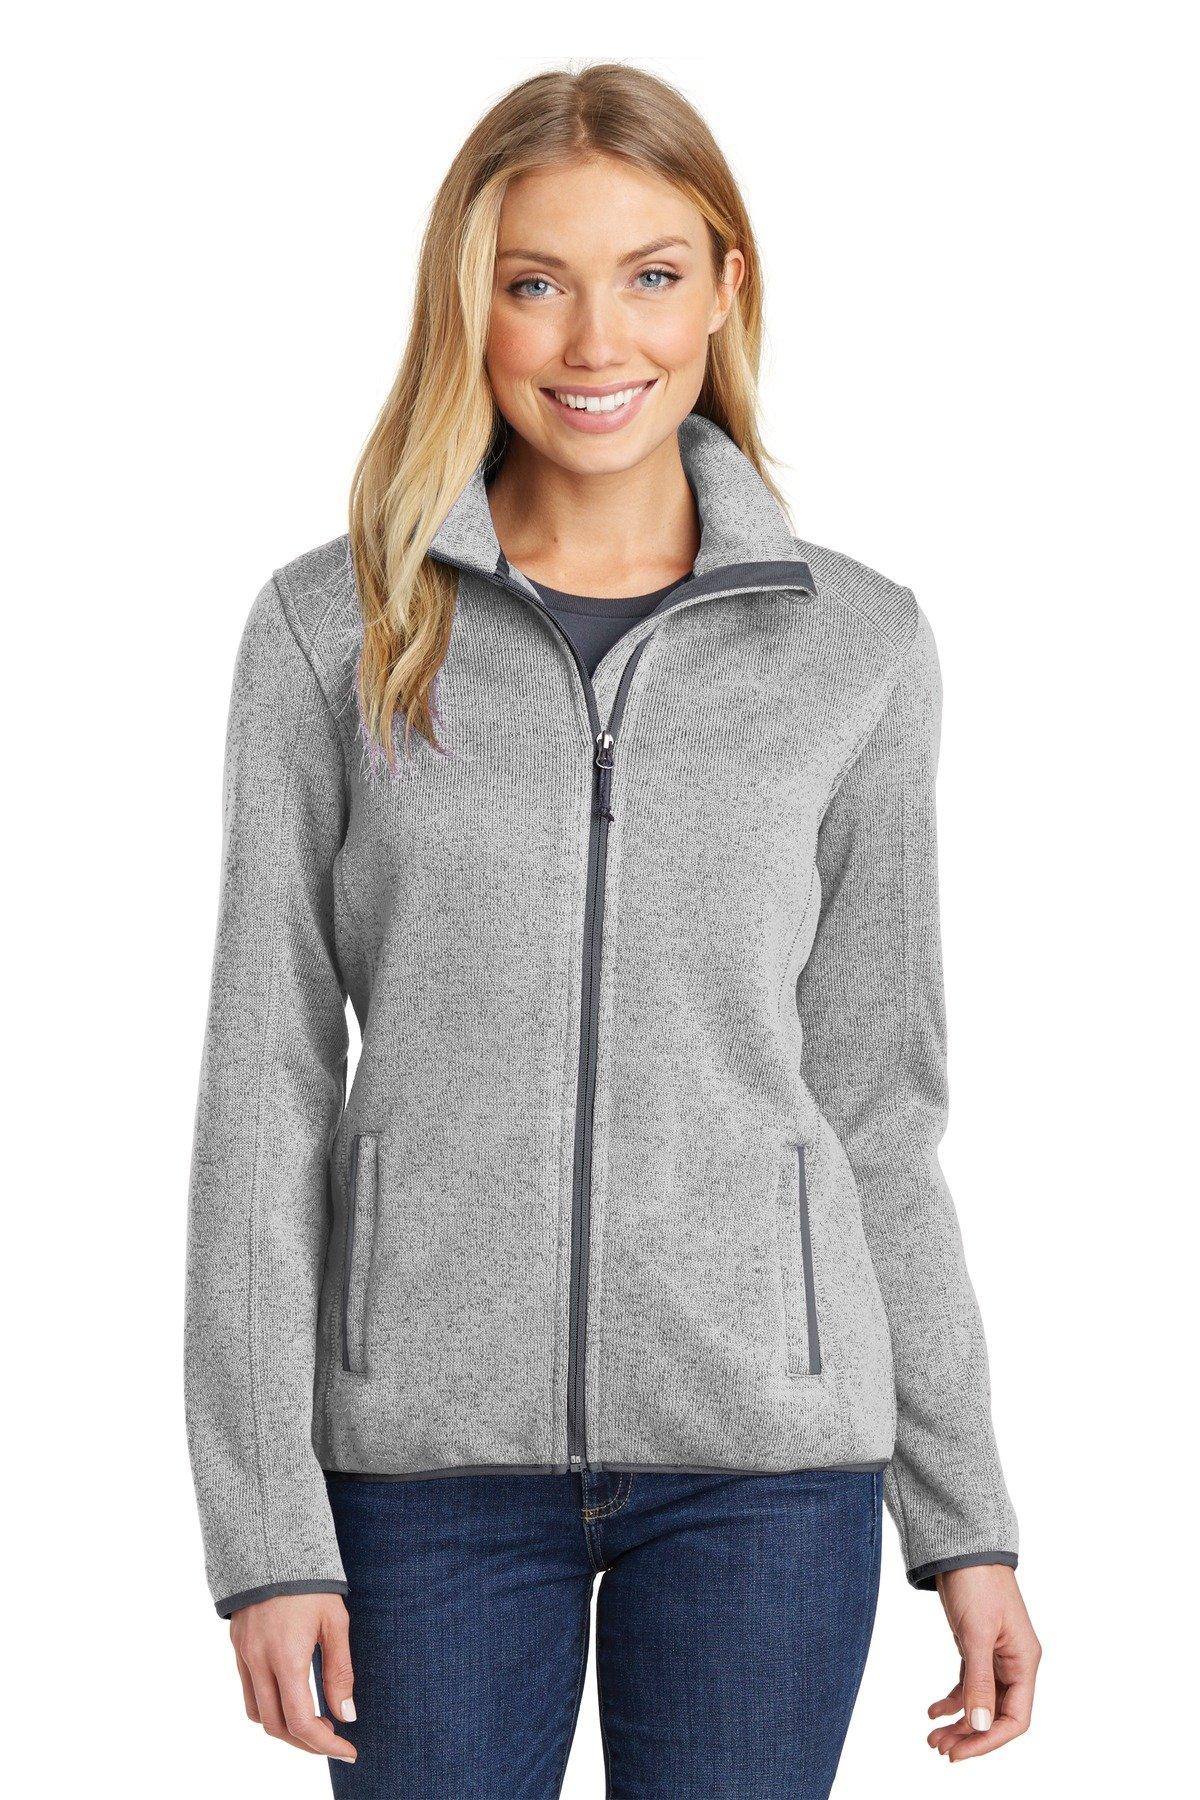 Port Authority Women's Sweater Fleece Jacket L232 Grey Heather Medium